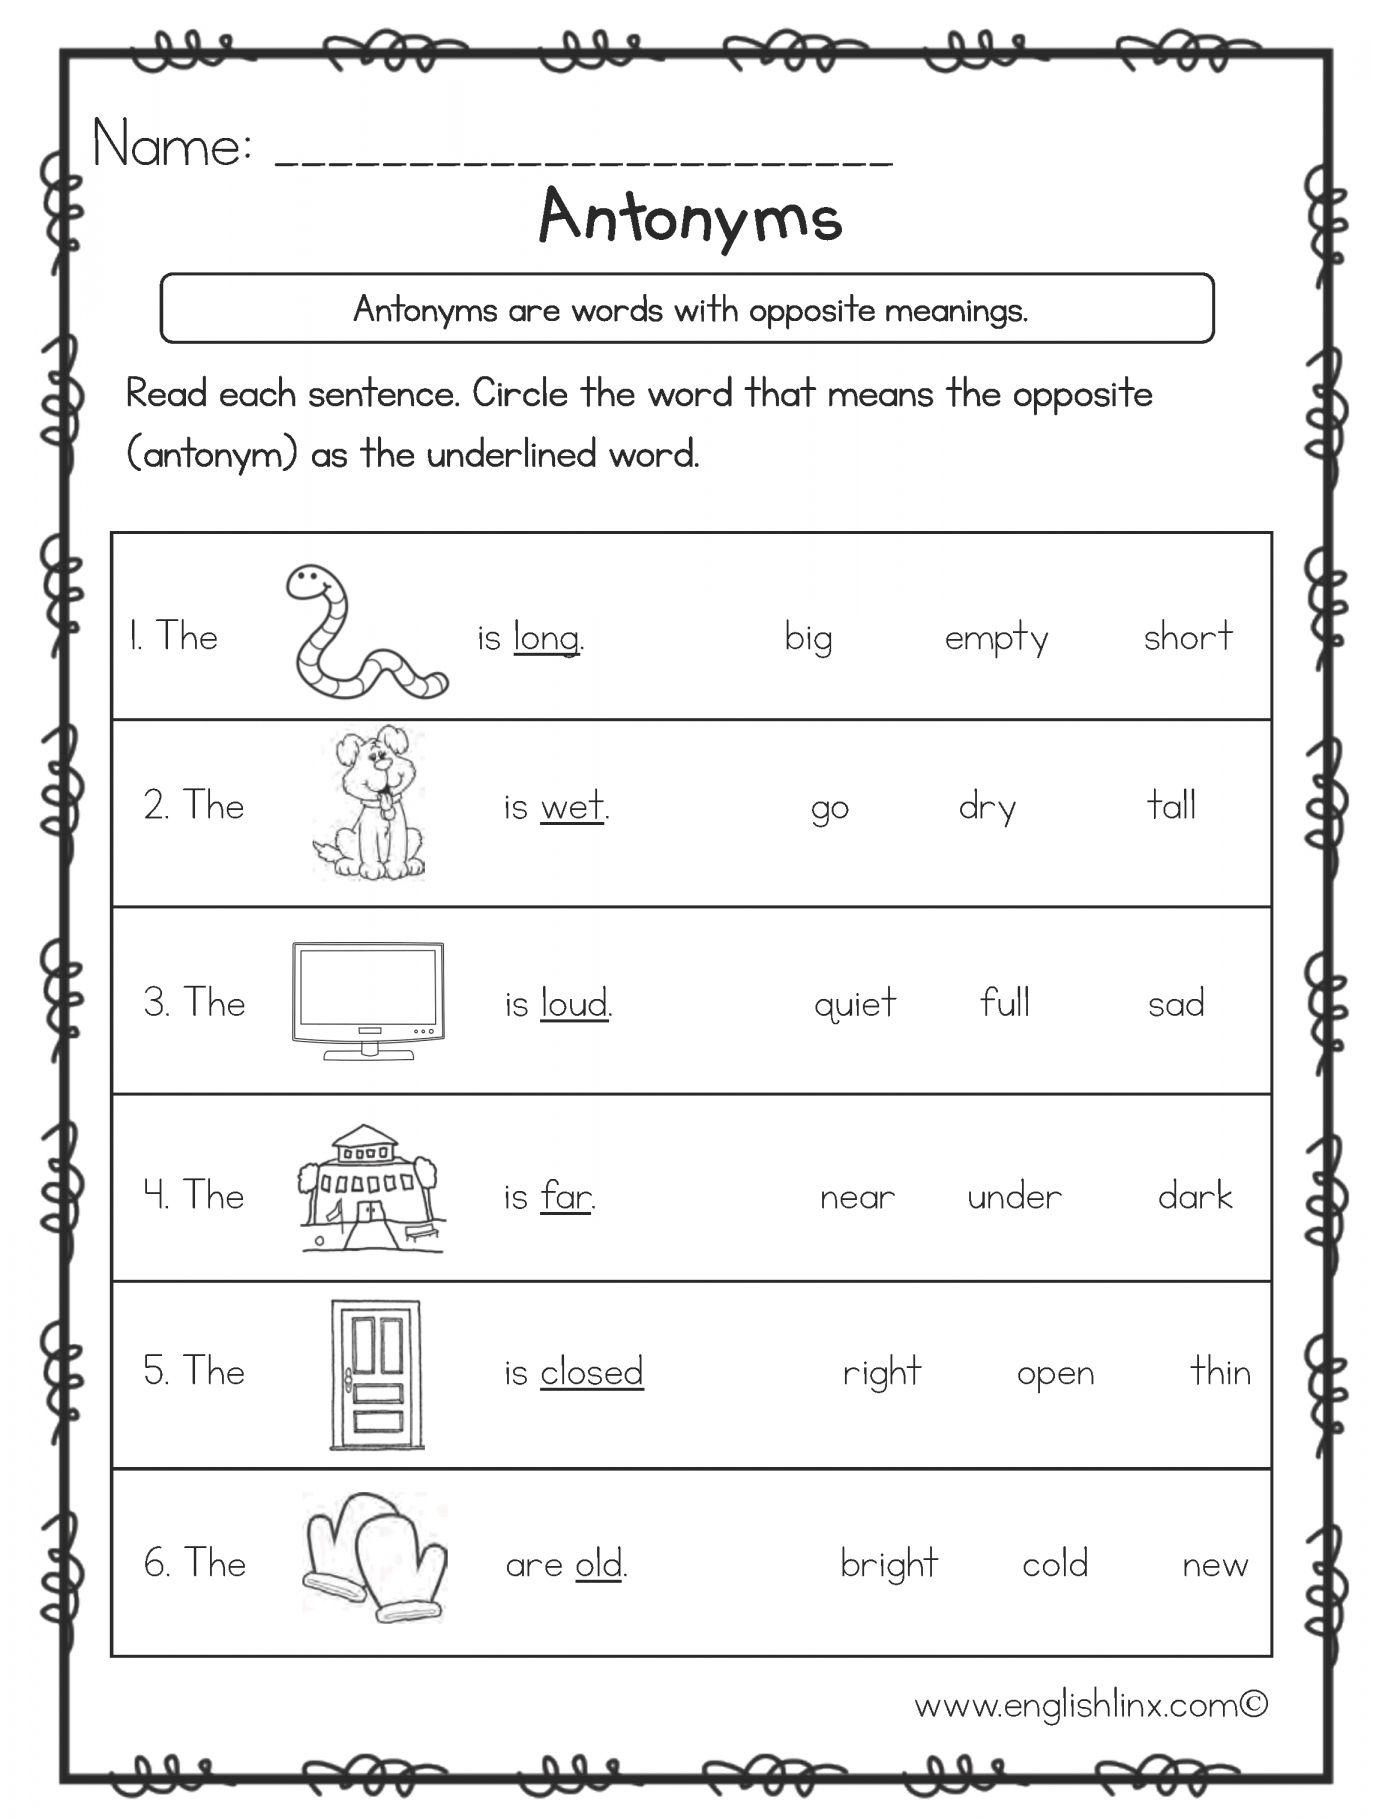 9 Antonyms Worksheets 2nd Grade Antonyms Worksheet Synonym Worksheet English Worksheets For Kids